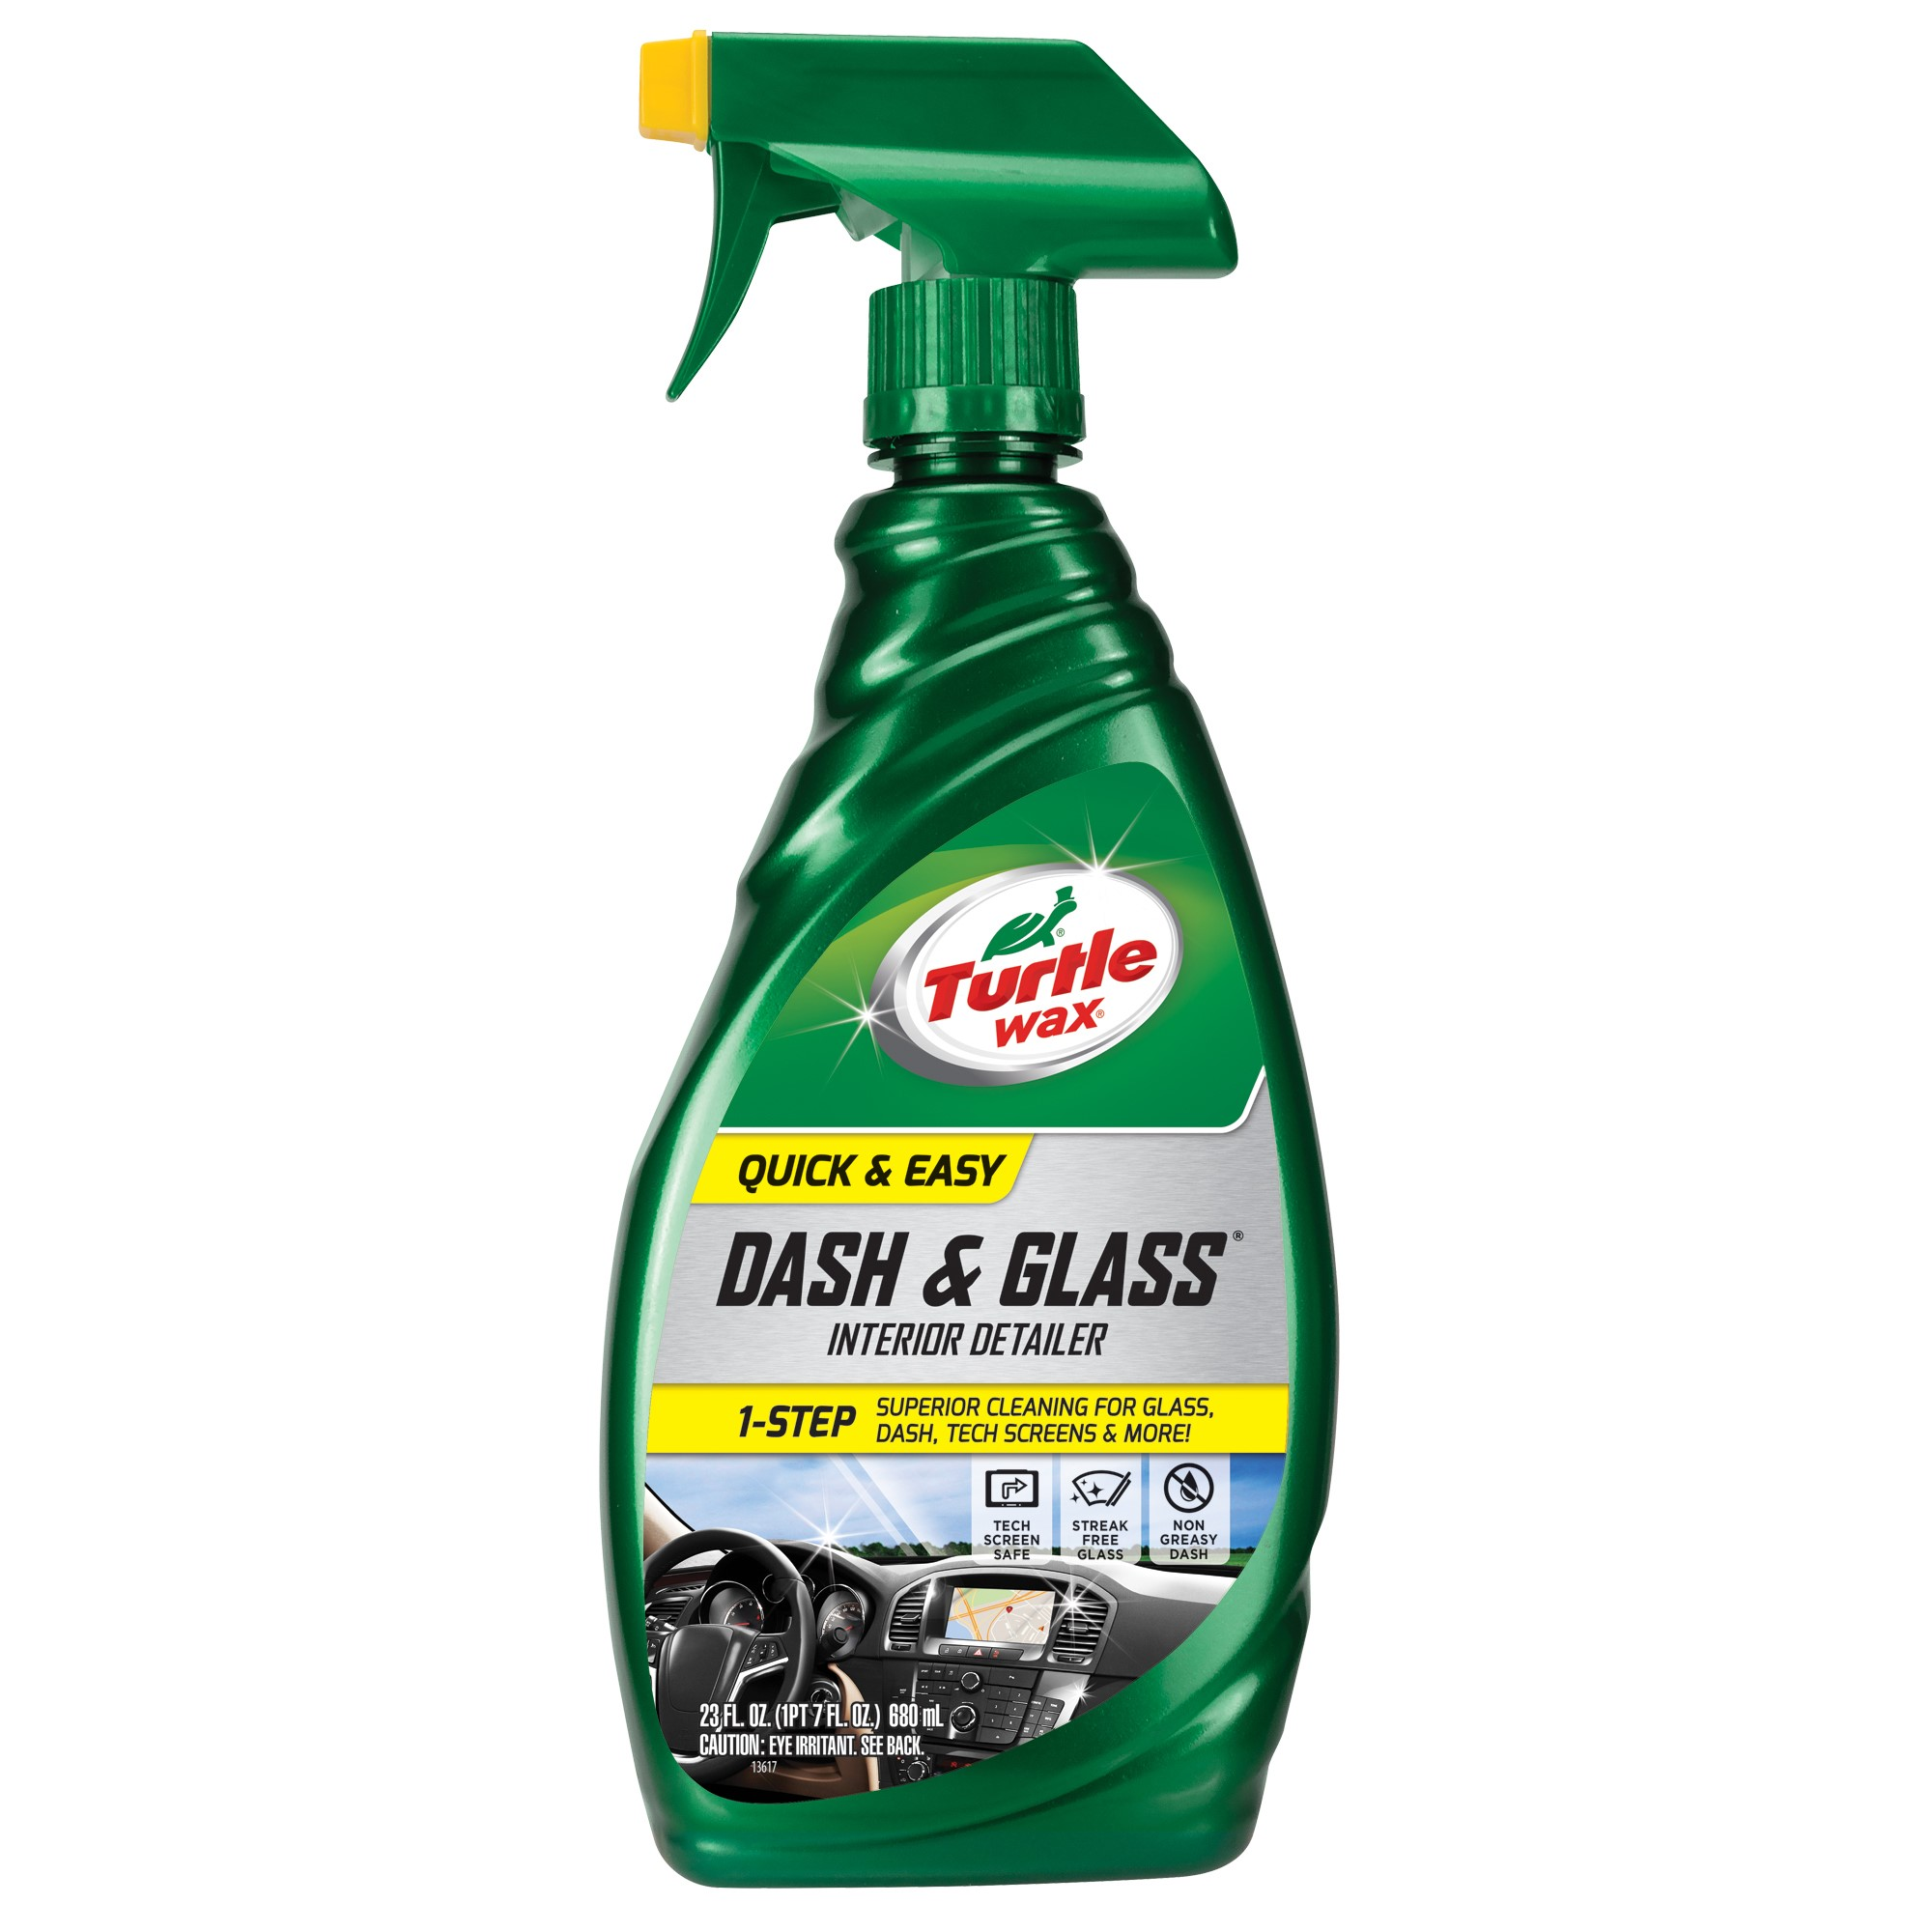 Turtle Wax Quick & Easy Dash & Glass Interior Cleaner, 23.0 FL OZ